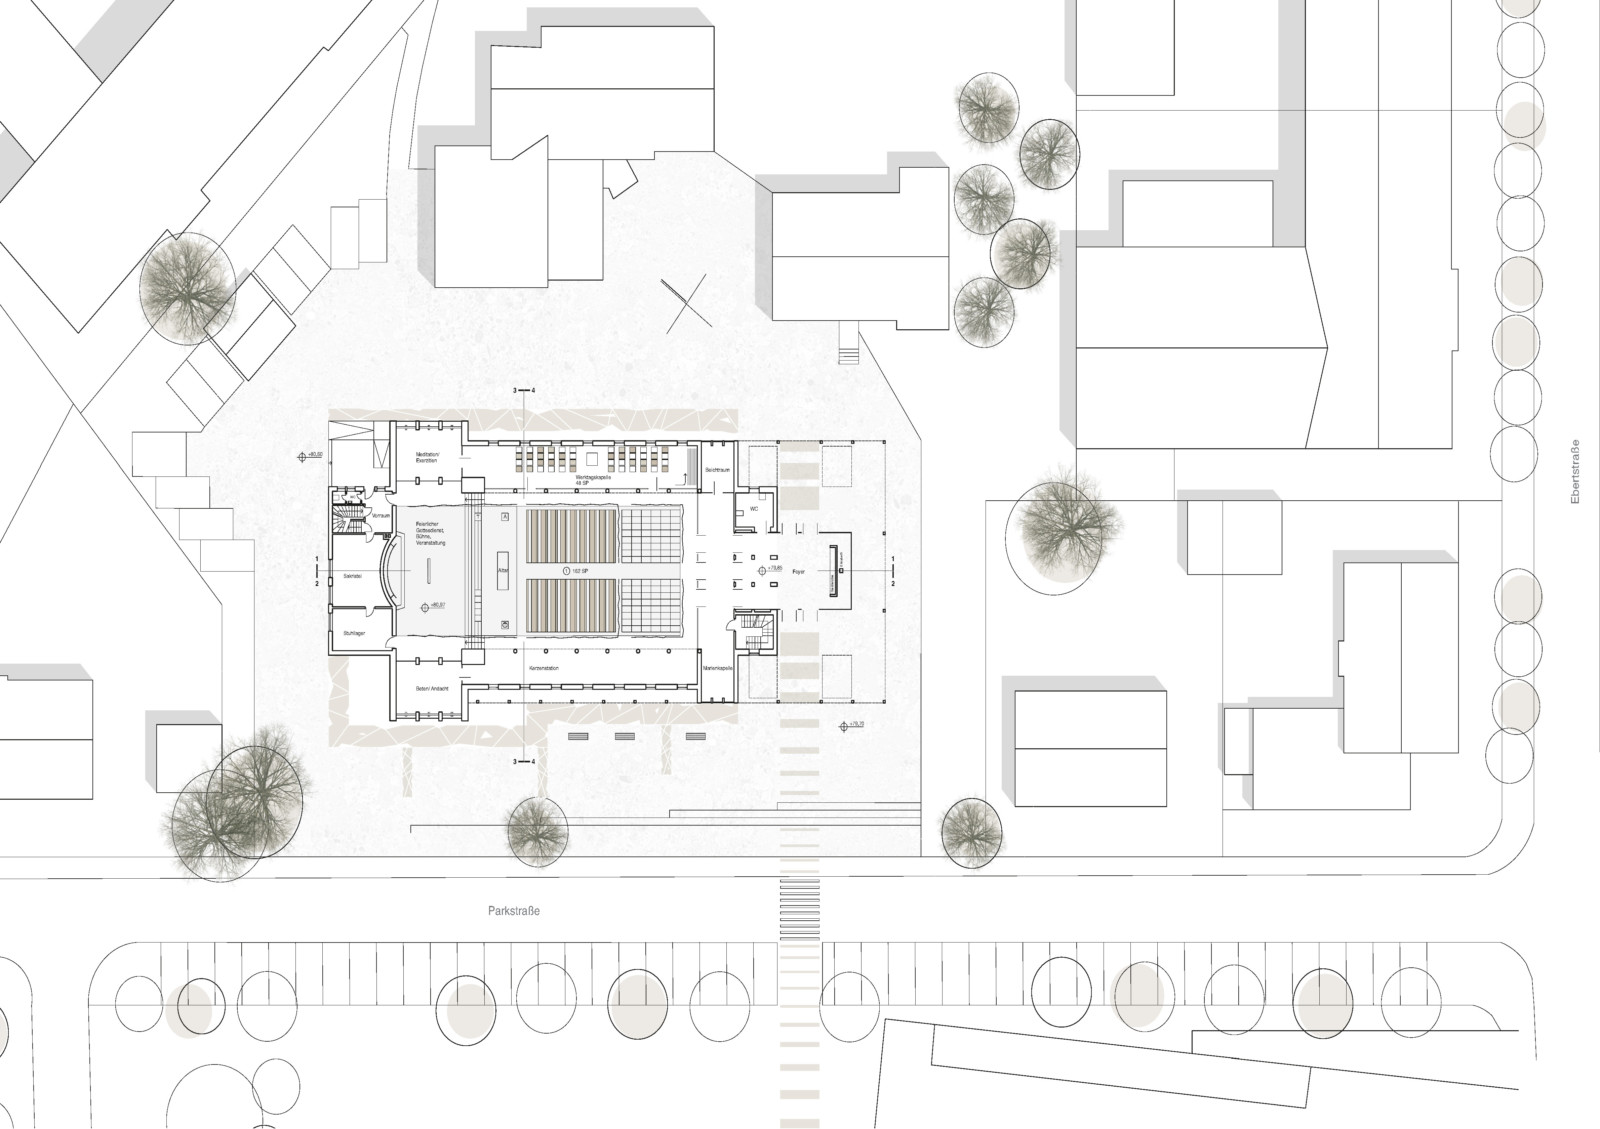 St. Elisabeth Kirche Bergkamen - Lageplan